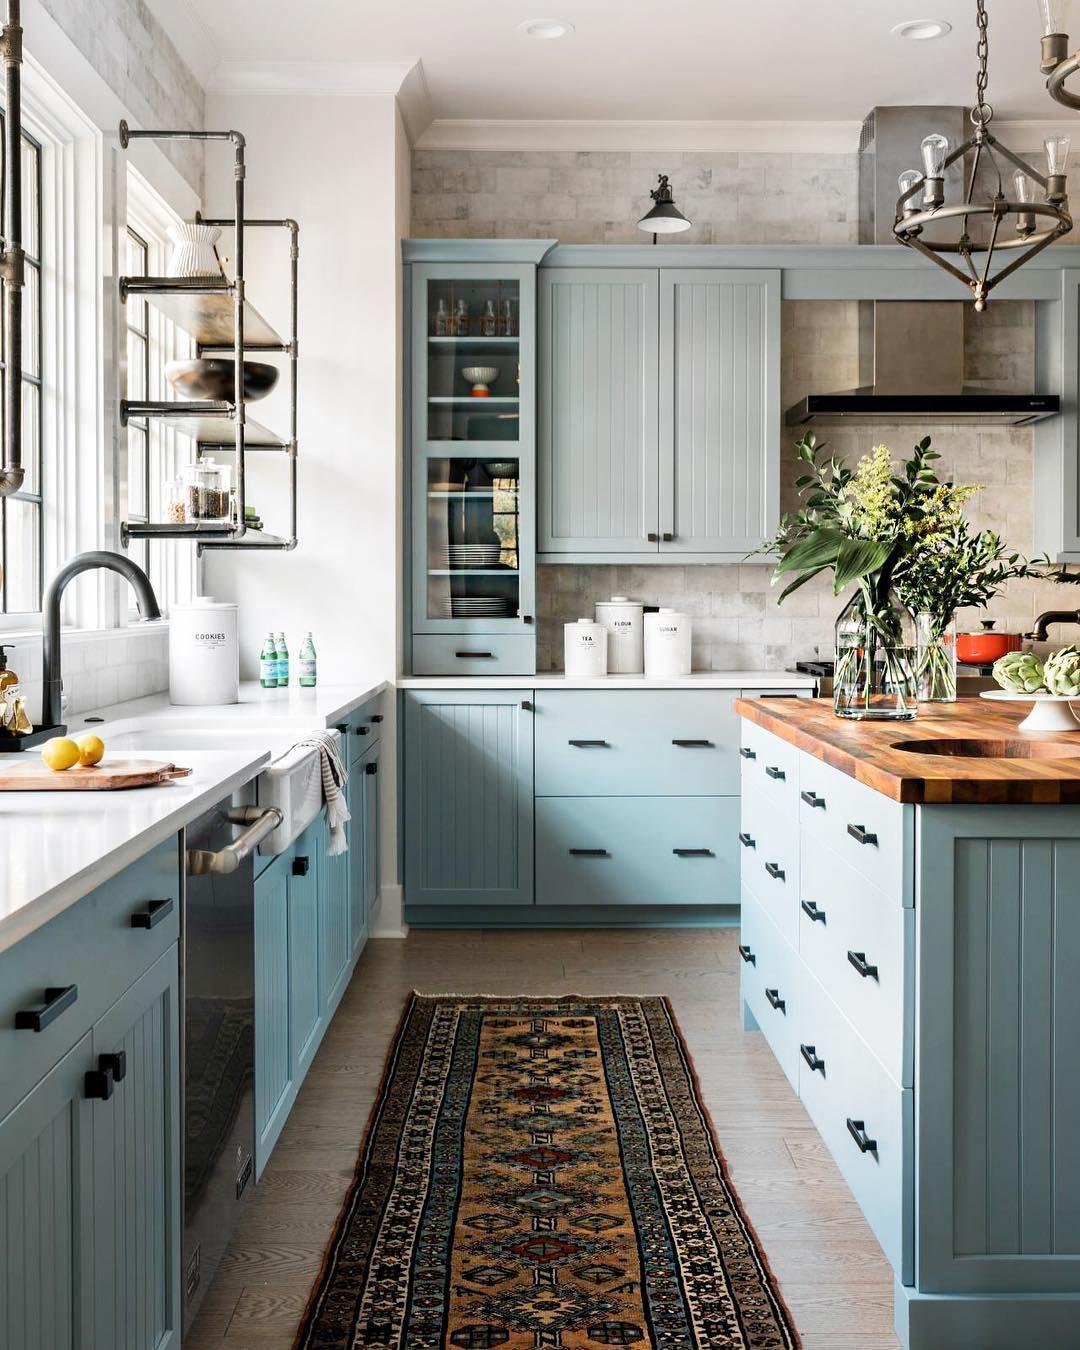 Tiffany Brooks Hgtv Designer On Instagram One Of My Favorite Kitchens I Ve Designed Tiffanybrooksinteriors Kitchen Design Kitchen Interior Home Kitchens